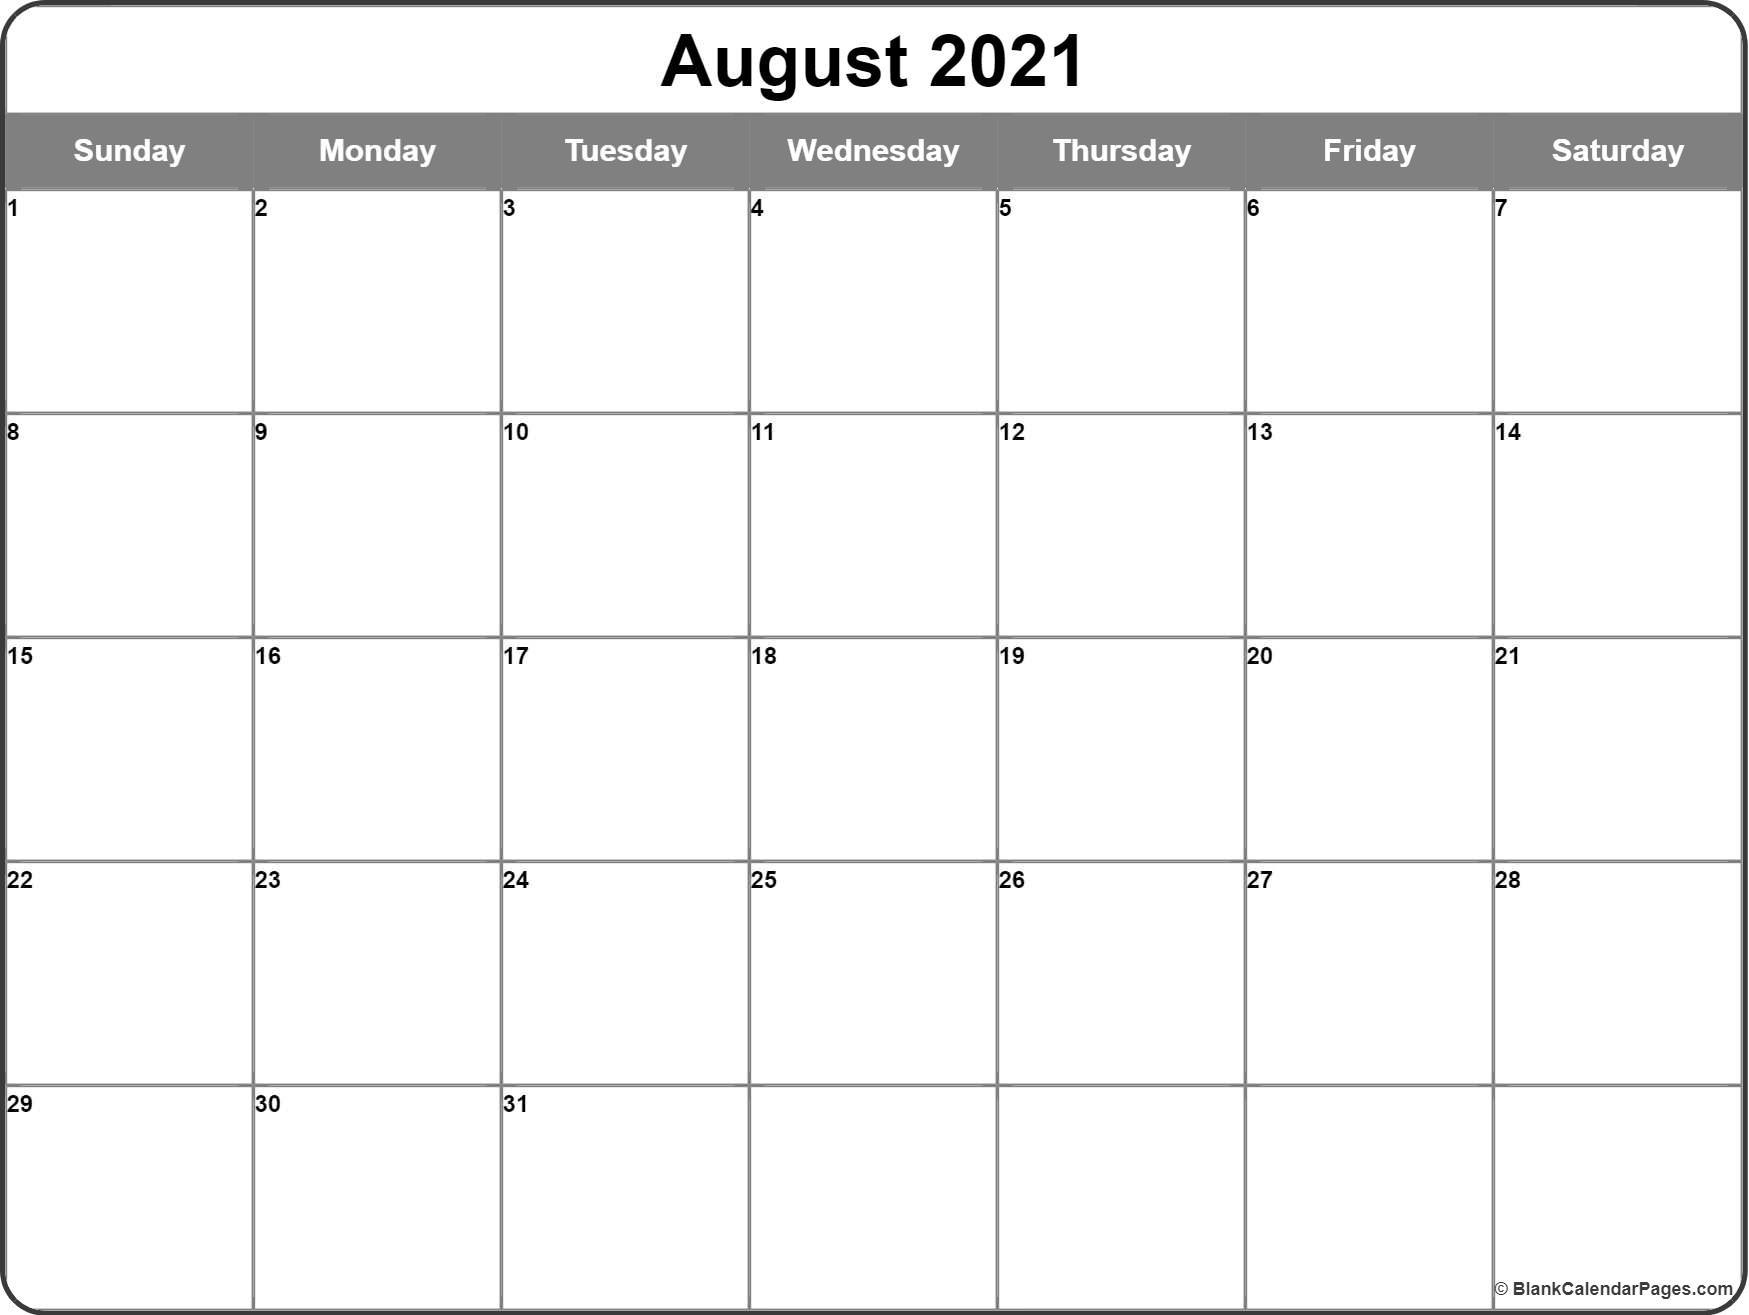 August 2021 Calendar   56+ Templates Of 2021 Printable Calendars August 2021 Calendar Images